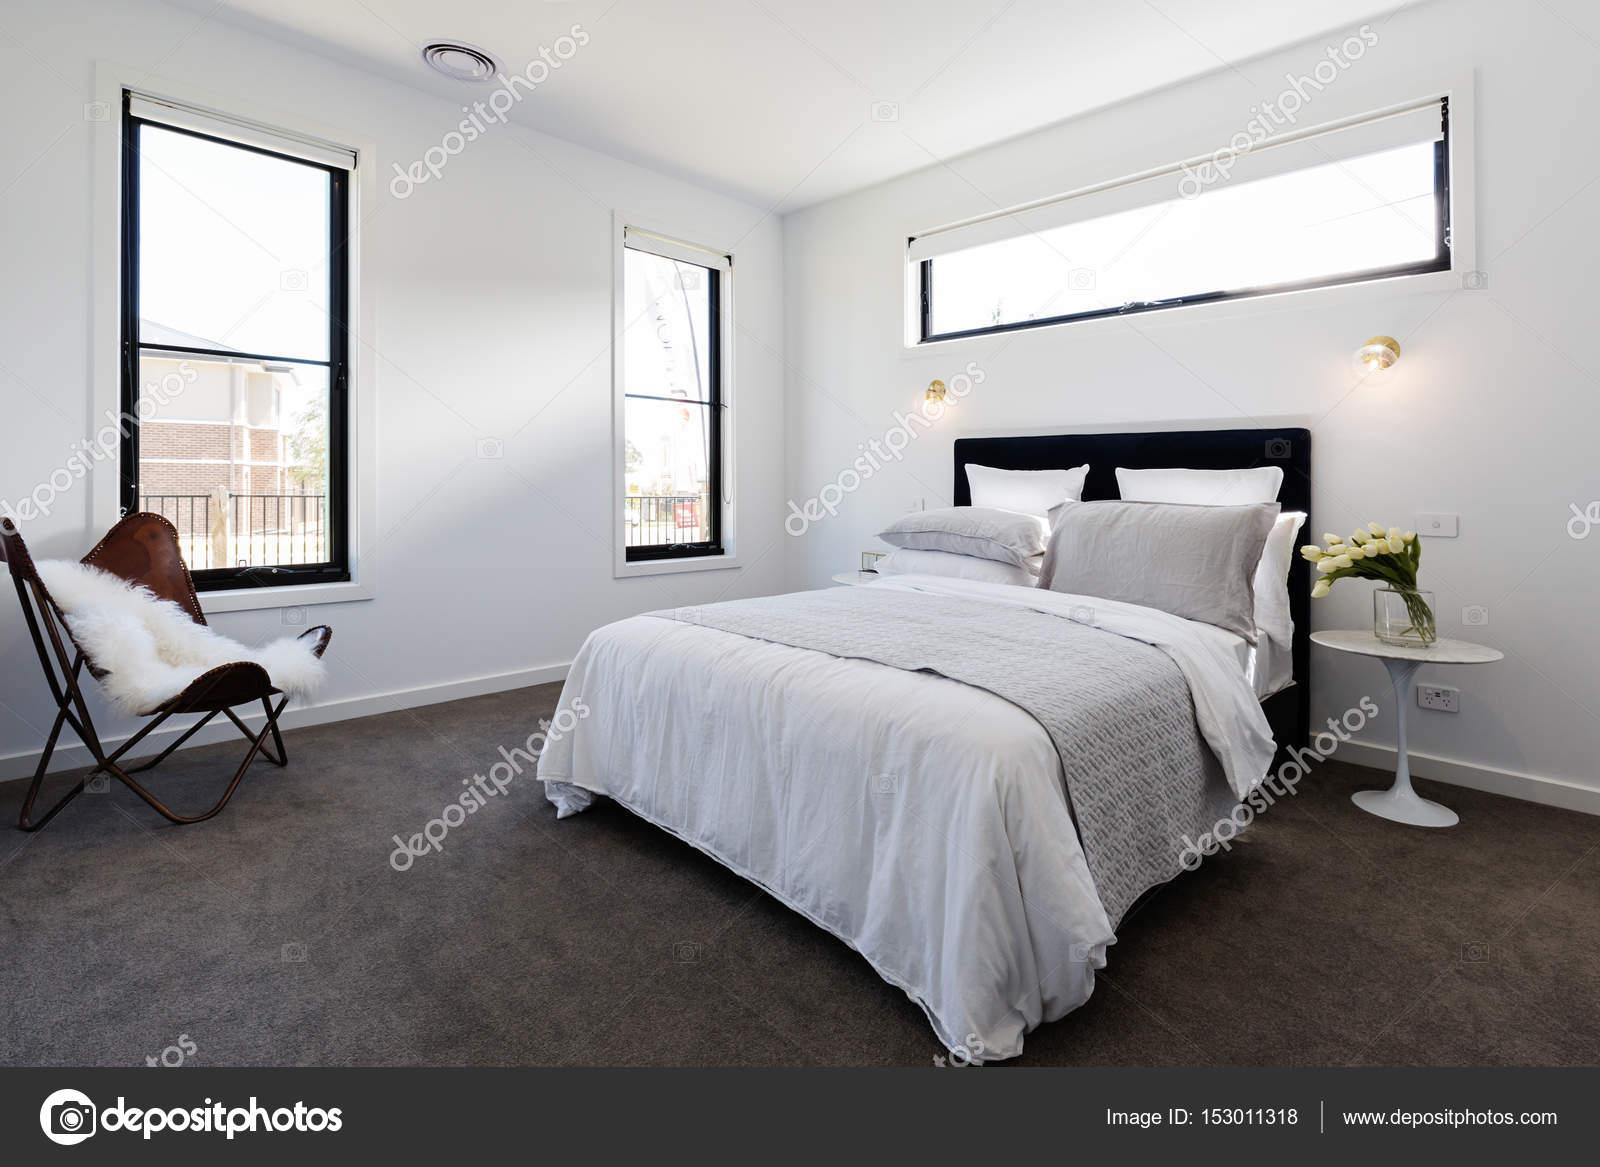 Slaapkamer En Suite : Hedendaagse slaapkamer suite u2014 stockfoto © jodiejohnson #153011318